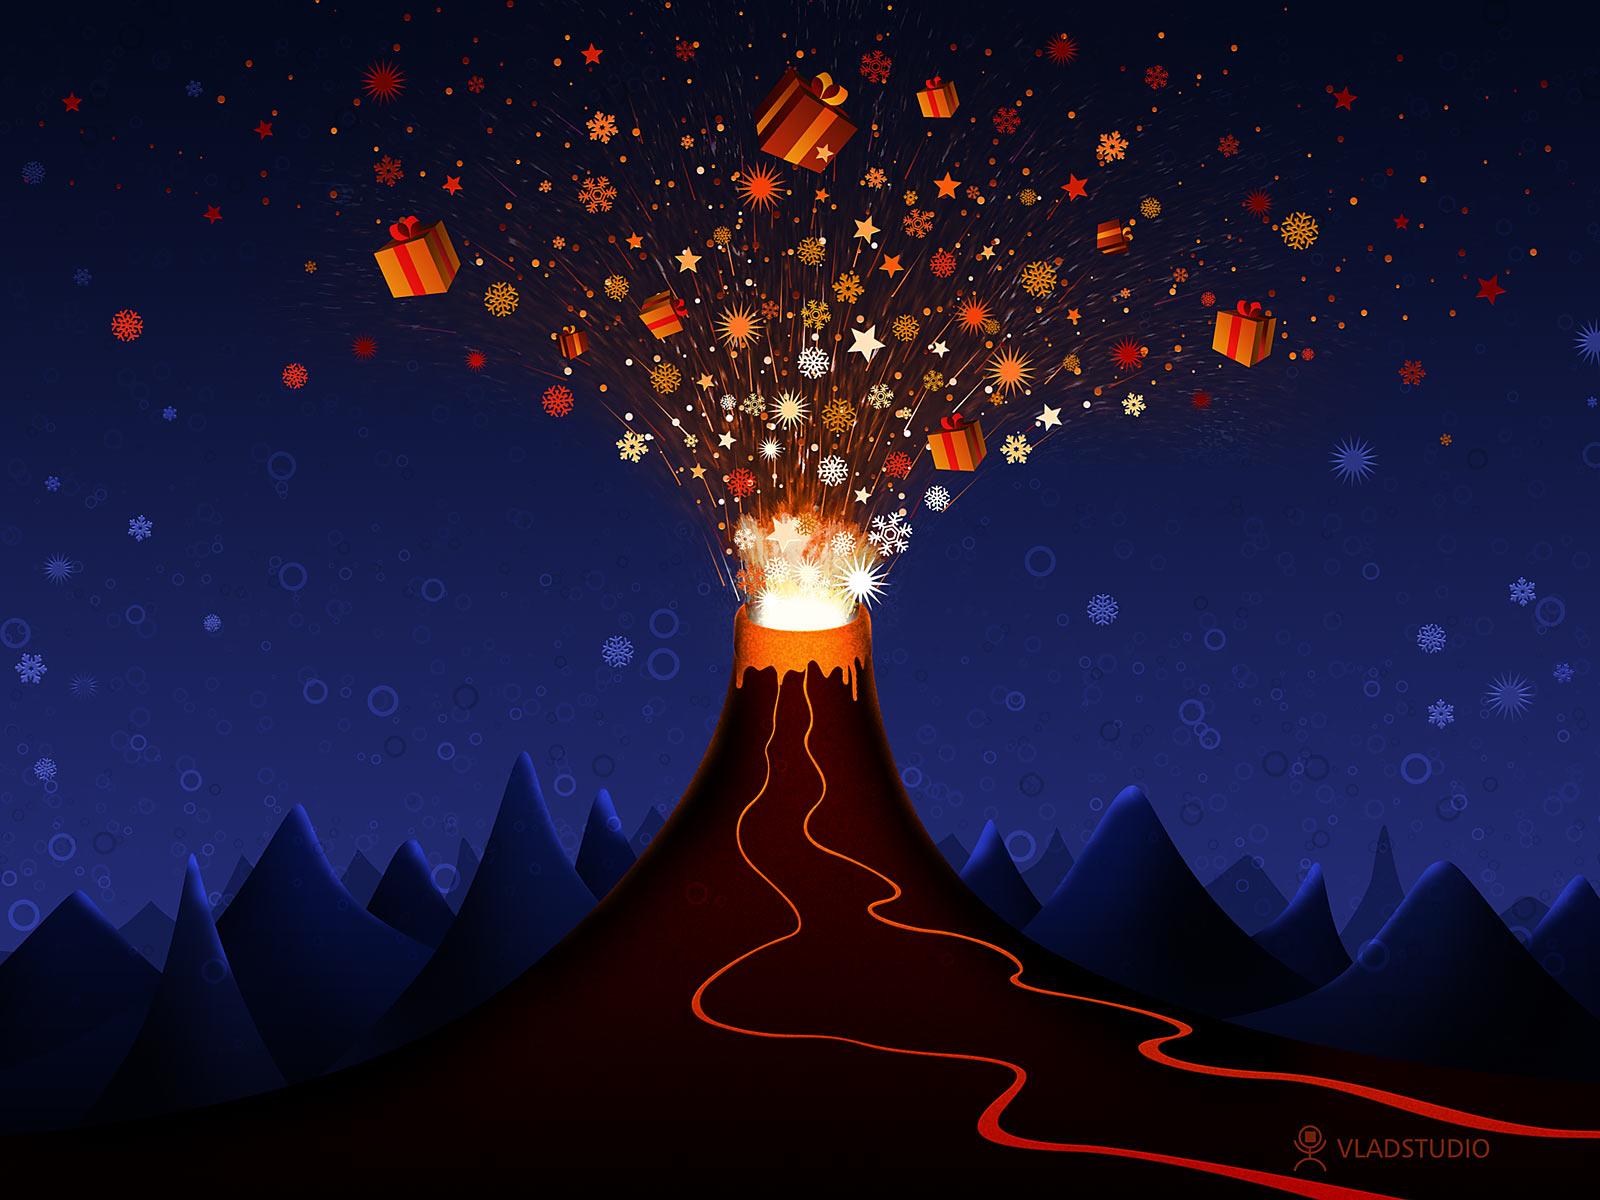 Christmas volcano by vladstudio on deviantart for Cool christmas art